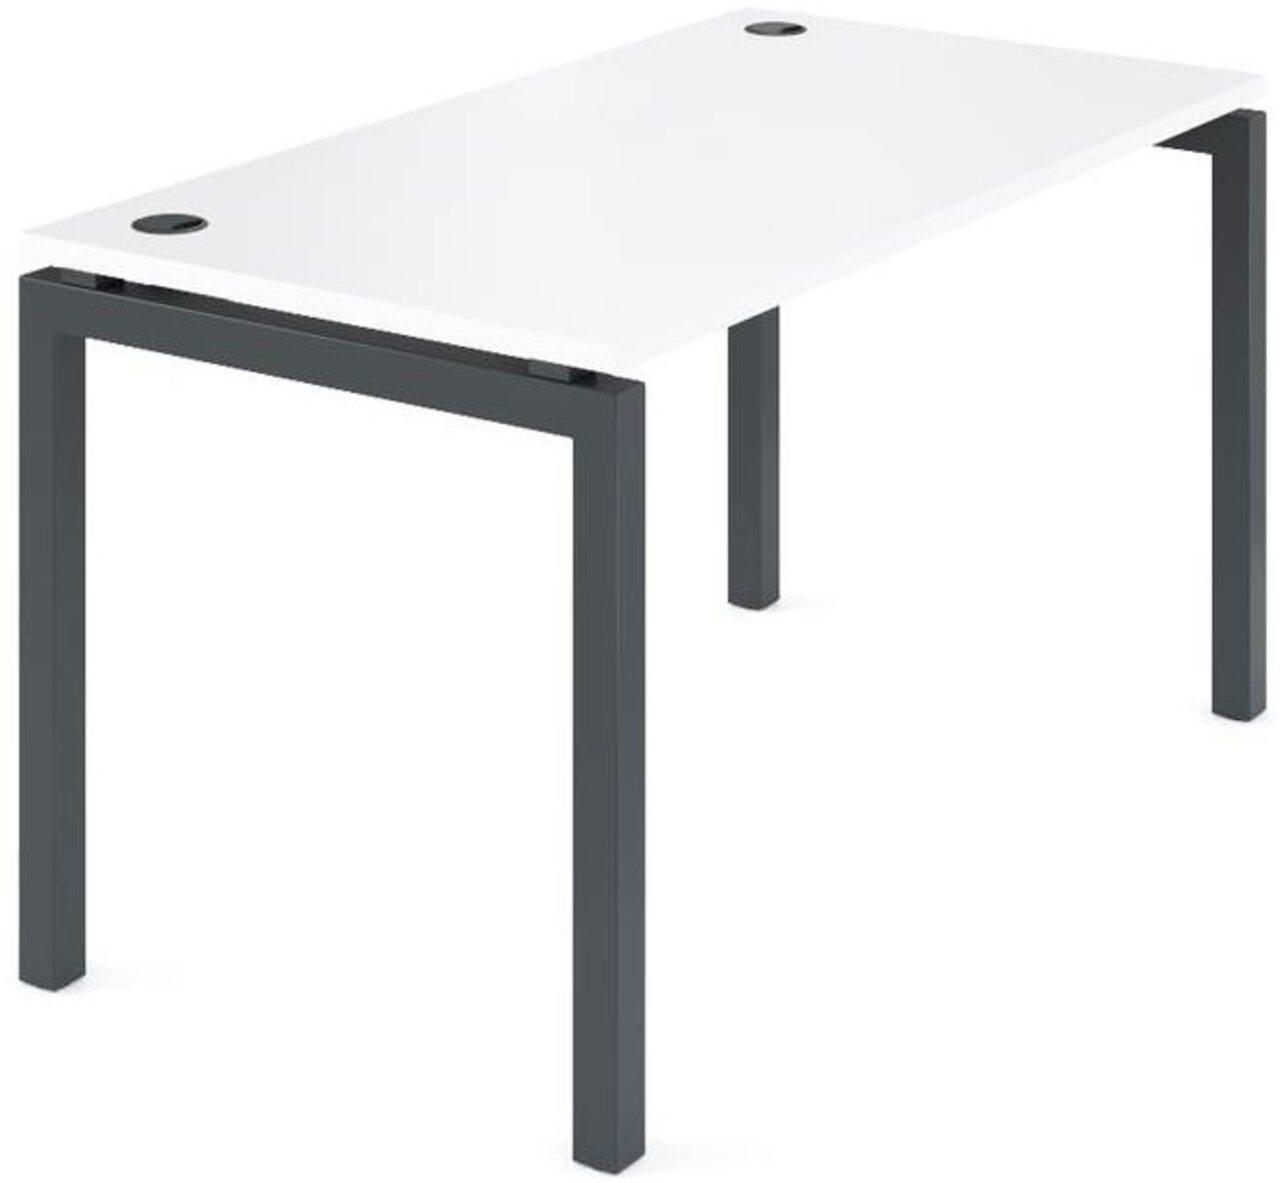 Стол на металлокаркасе  Арго 140x73x76 - фото 1